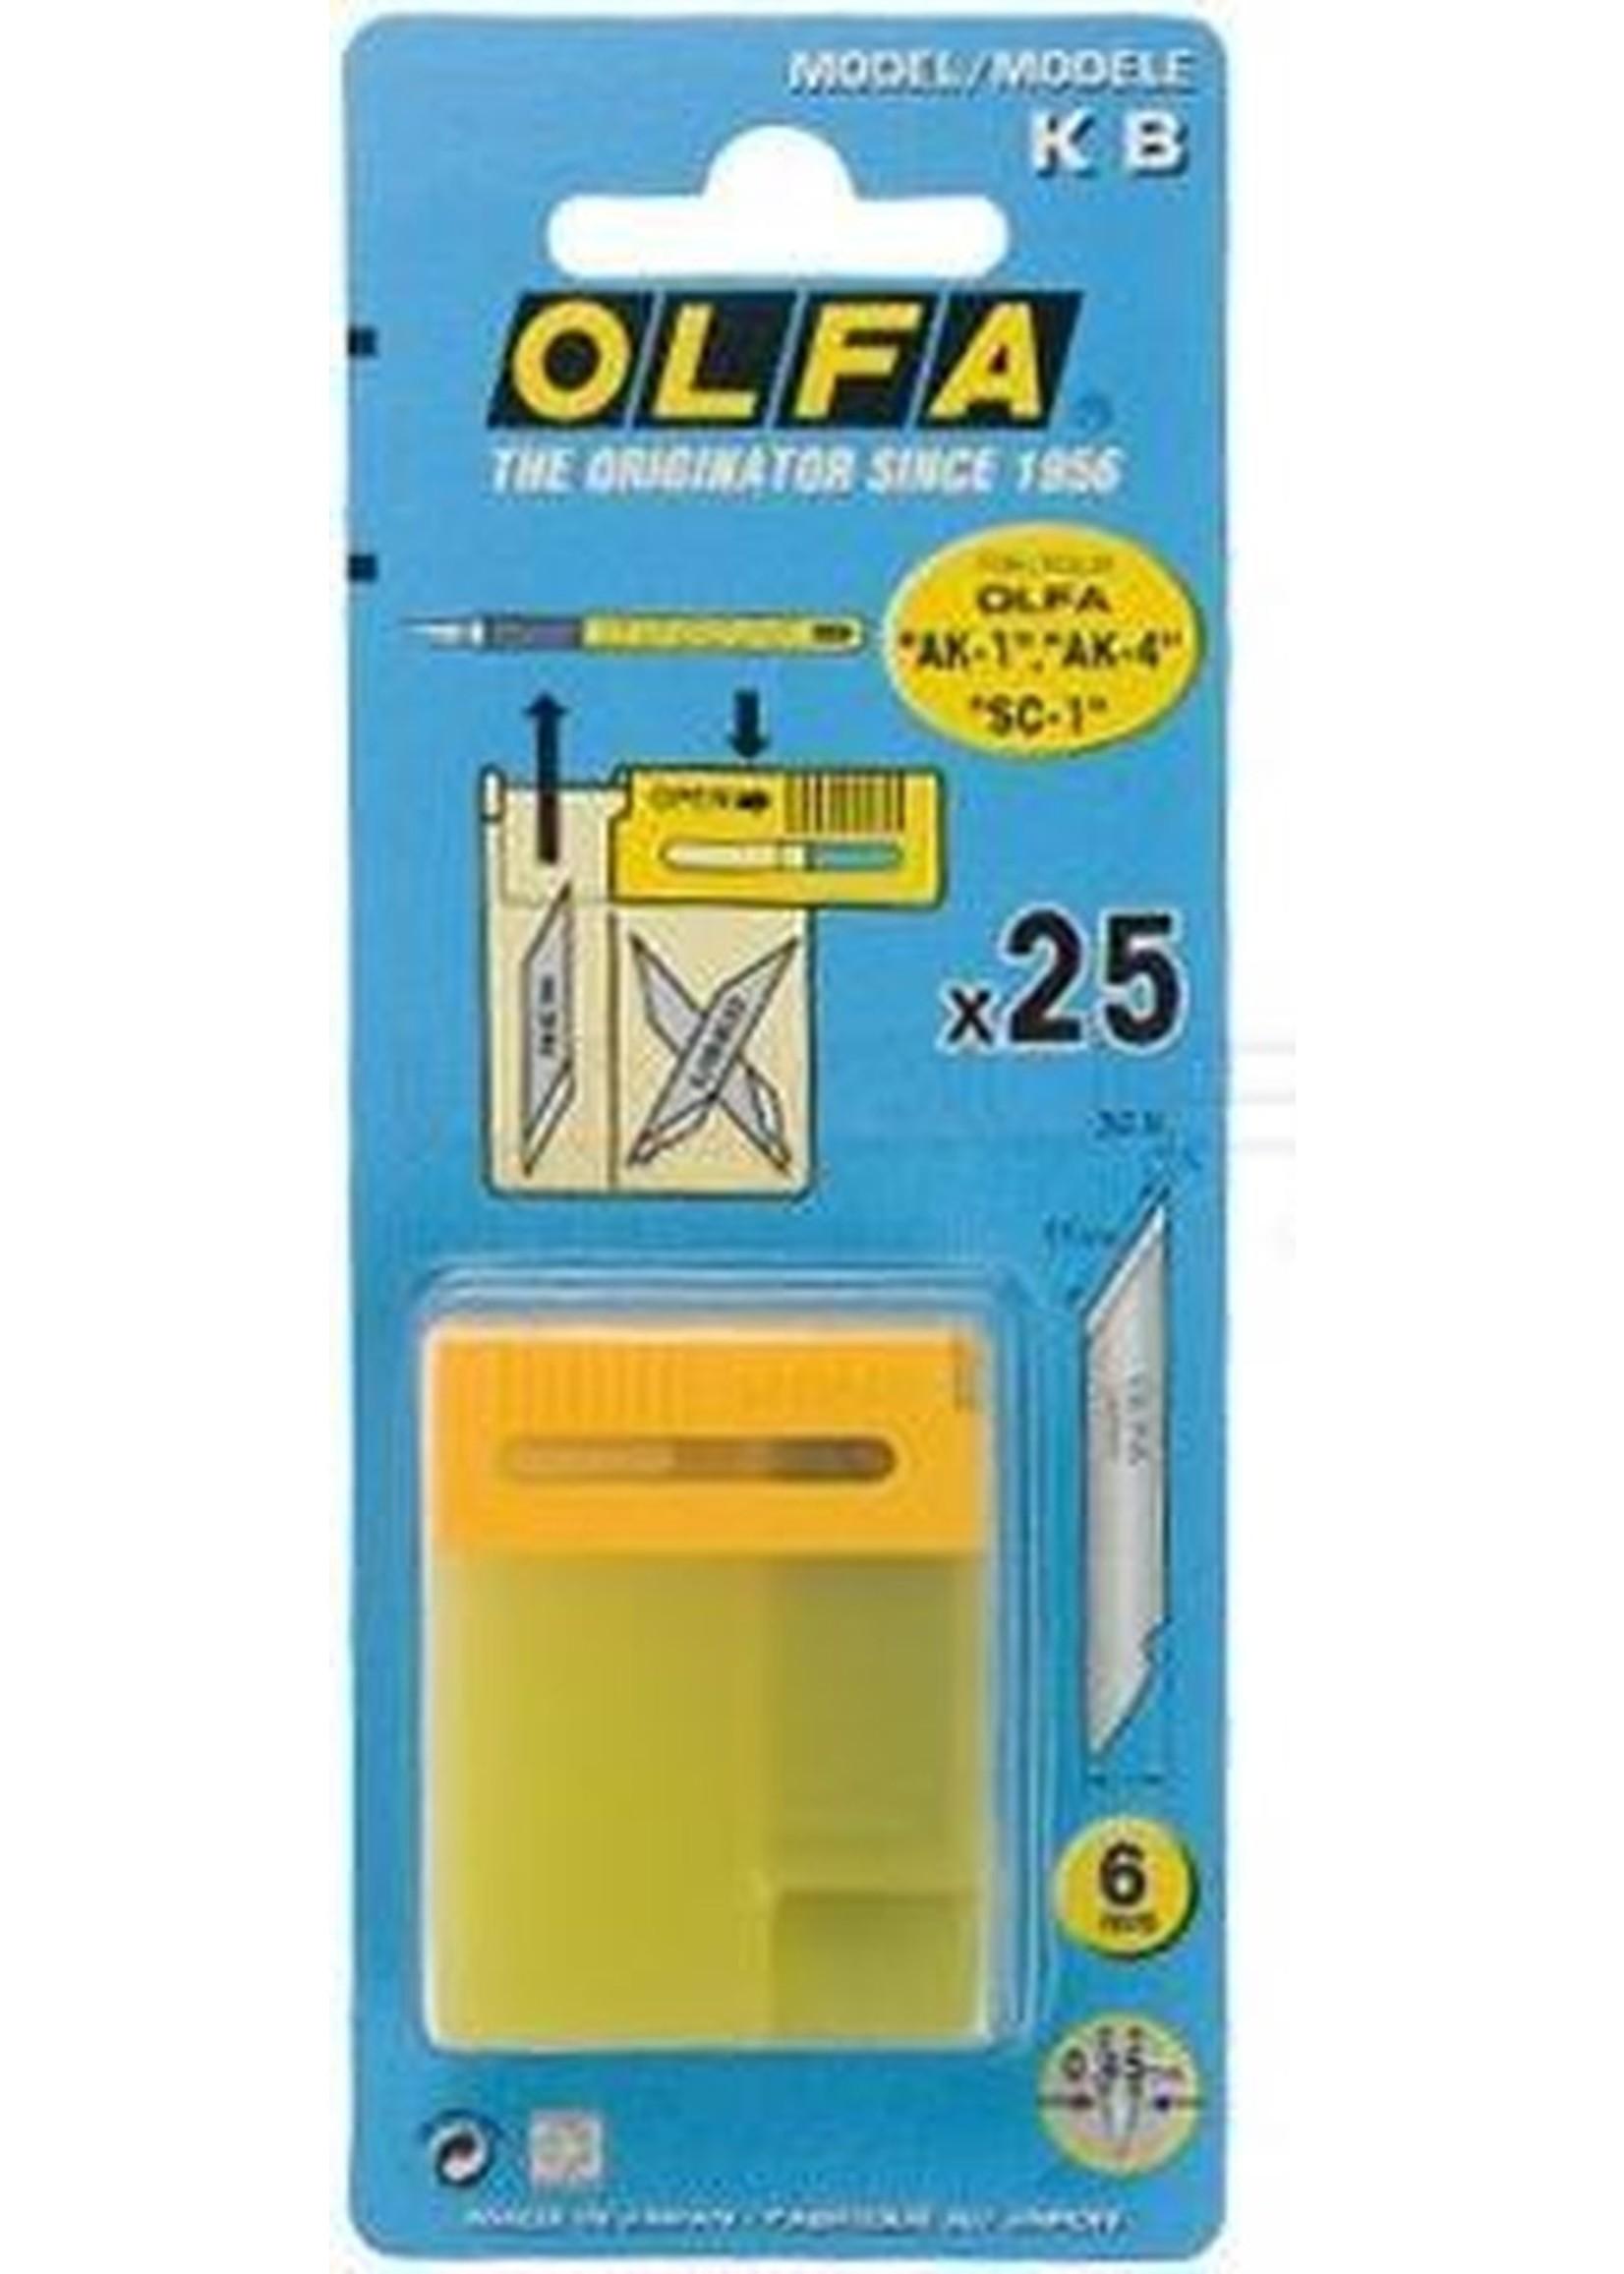 Olfa Olfa art-knive AK1 reserve mesjes 25 stuks